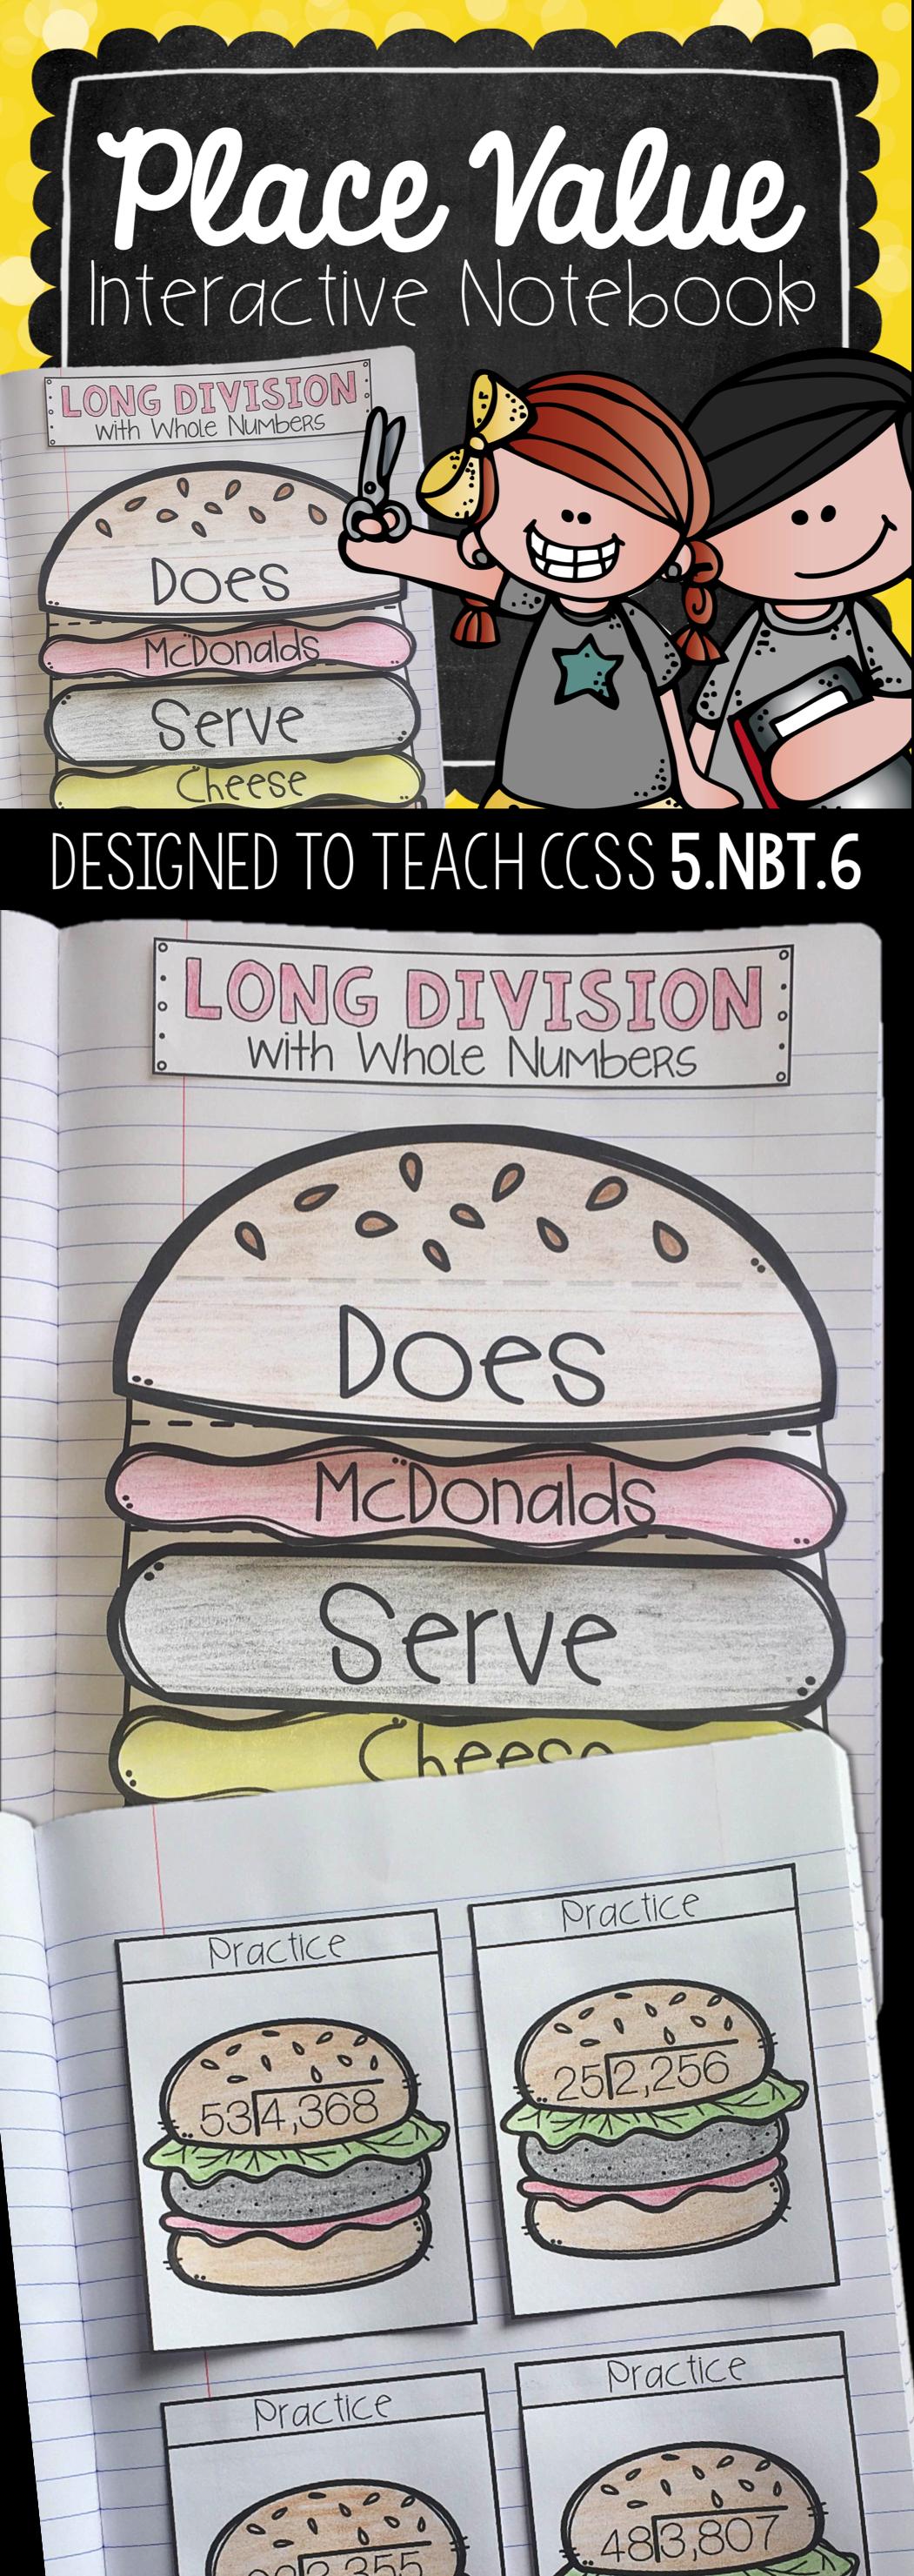 Long Division Does Mcdonalds Serve Burgers Interactive